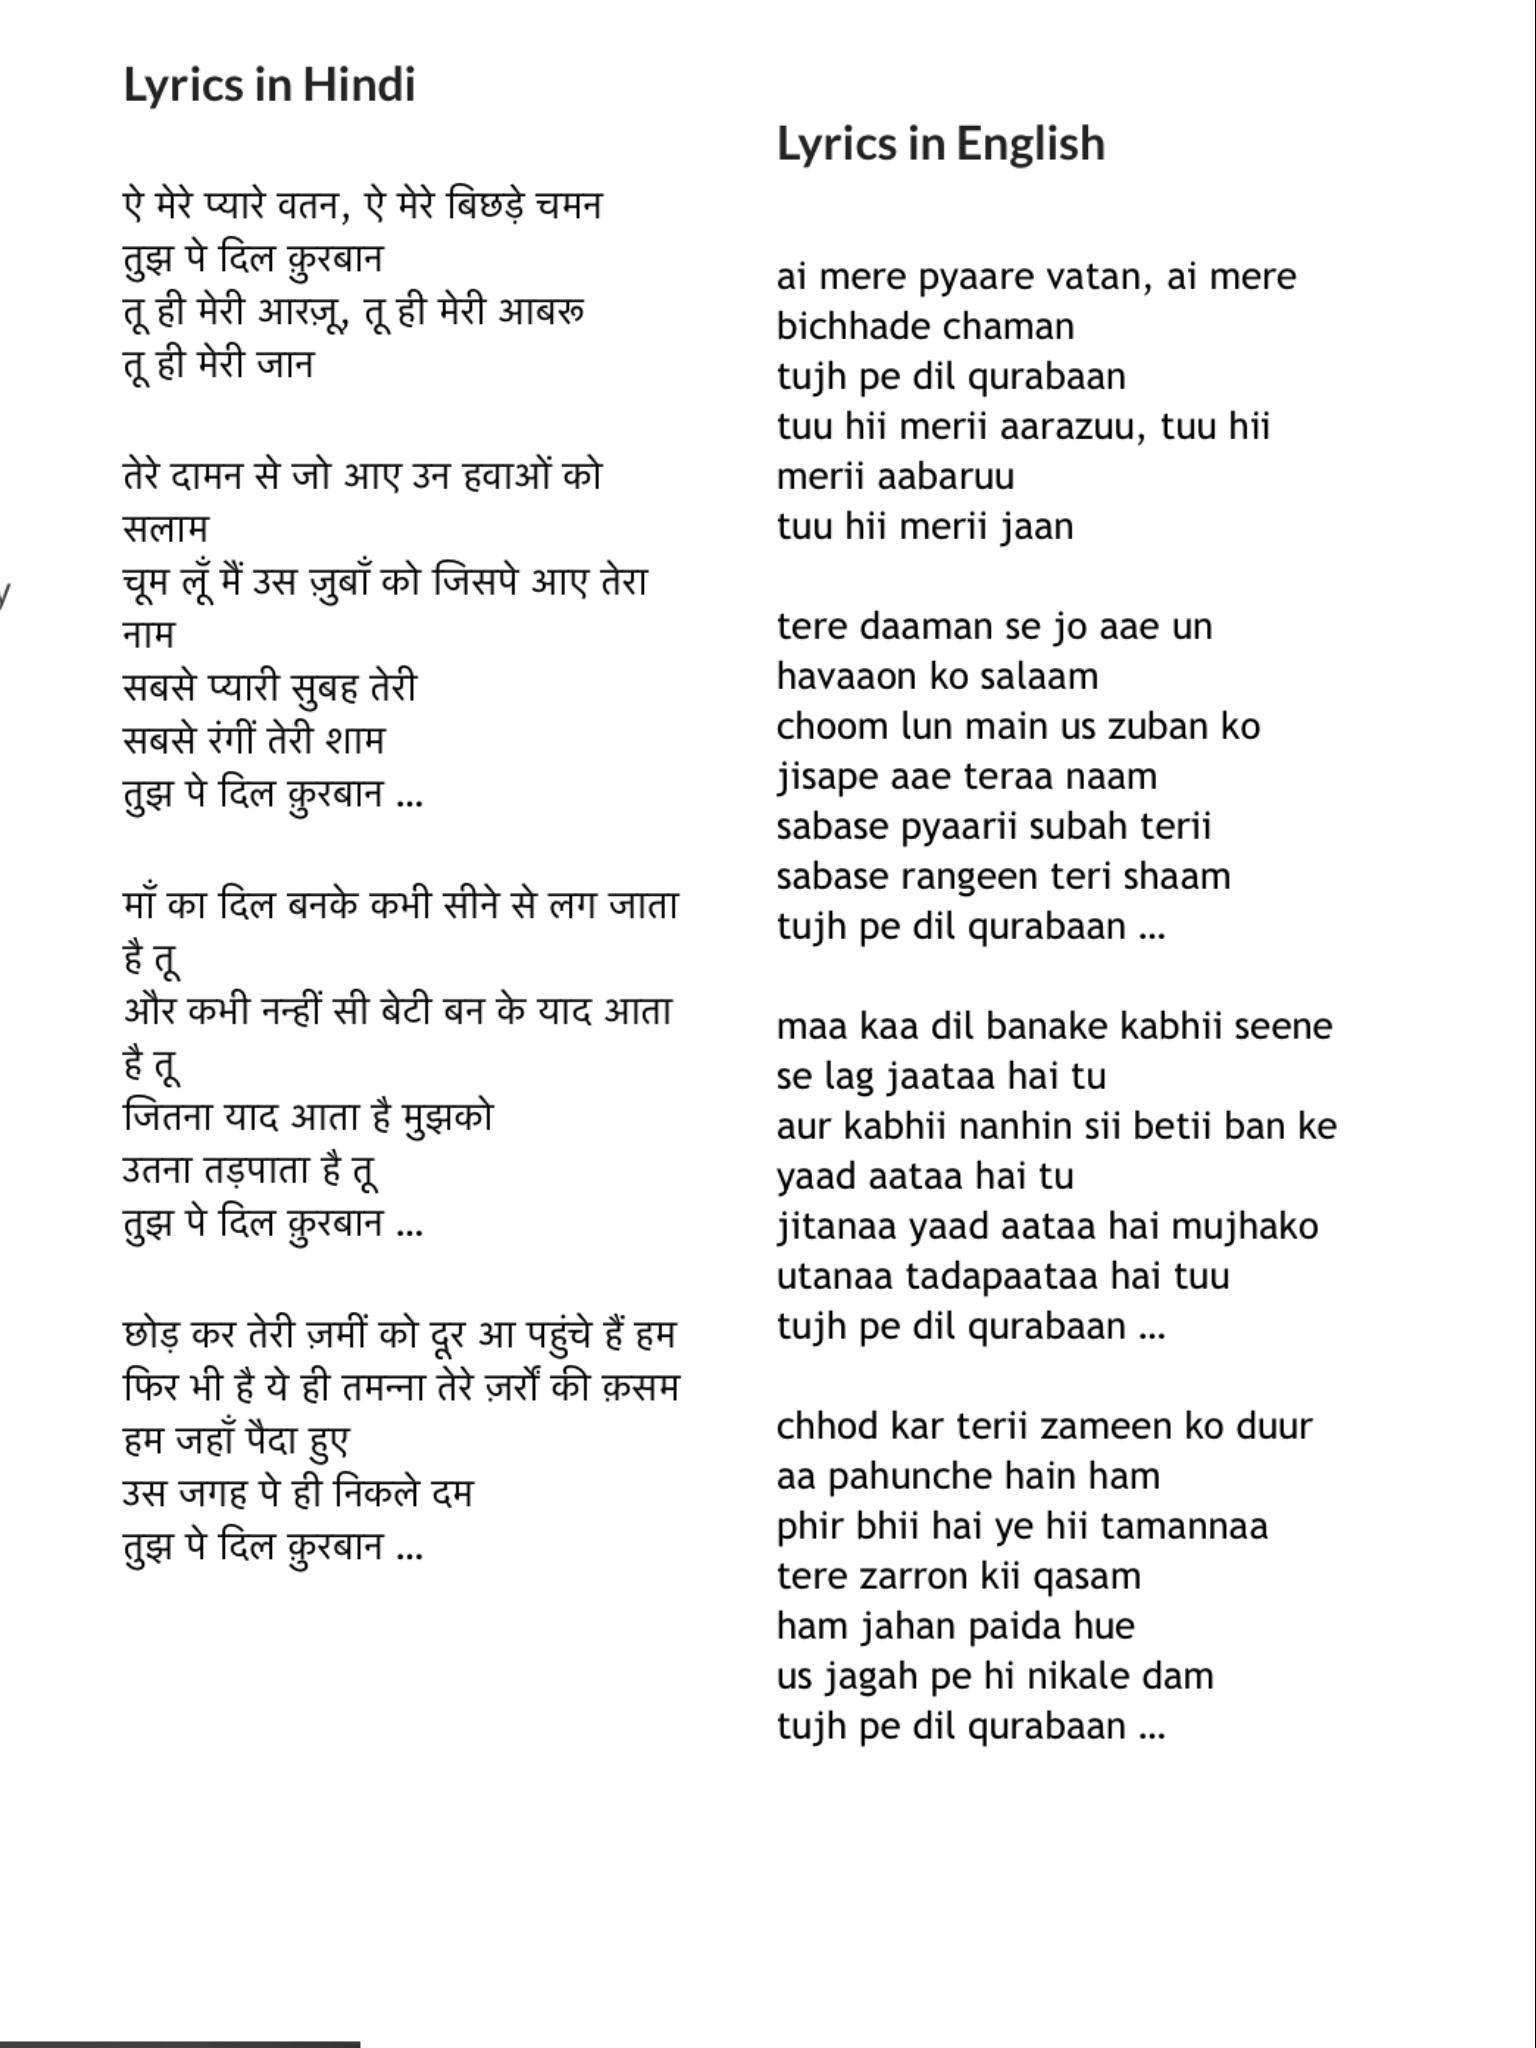 Pin By Sushma Batra Laxman On Hindi Songs And Lyrics Pinterest